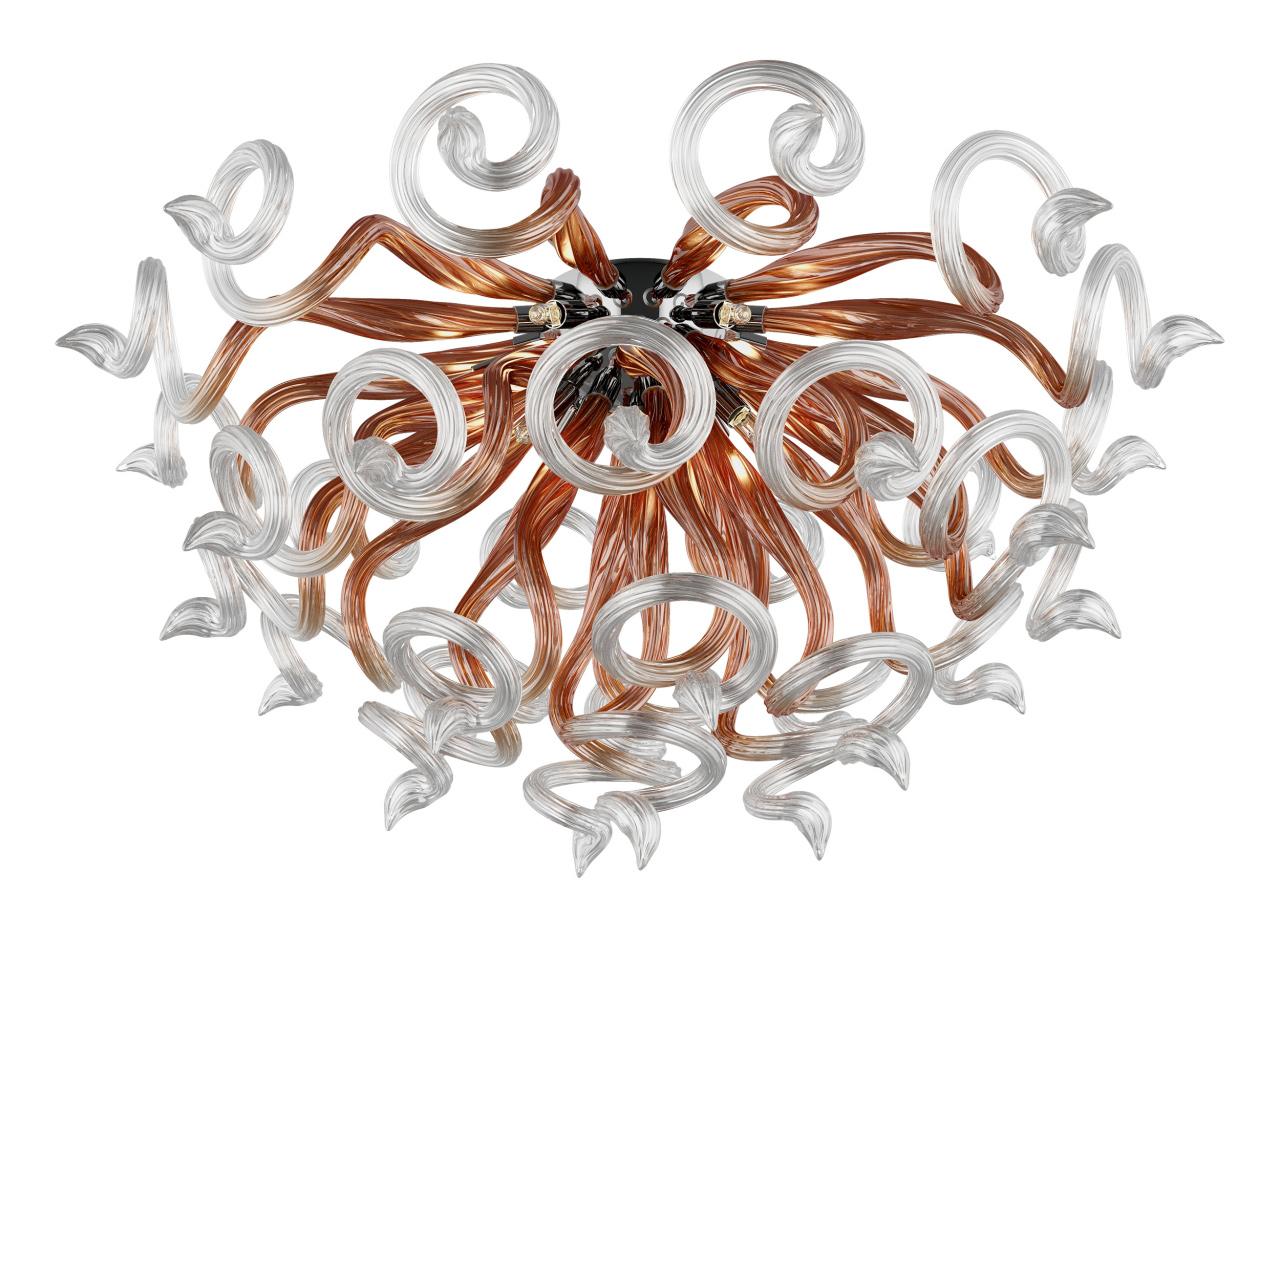 Люстра потолочная Medusa 9x40W G9 прозрачный / янтарь+прозрачный Lightstar 890094